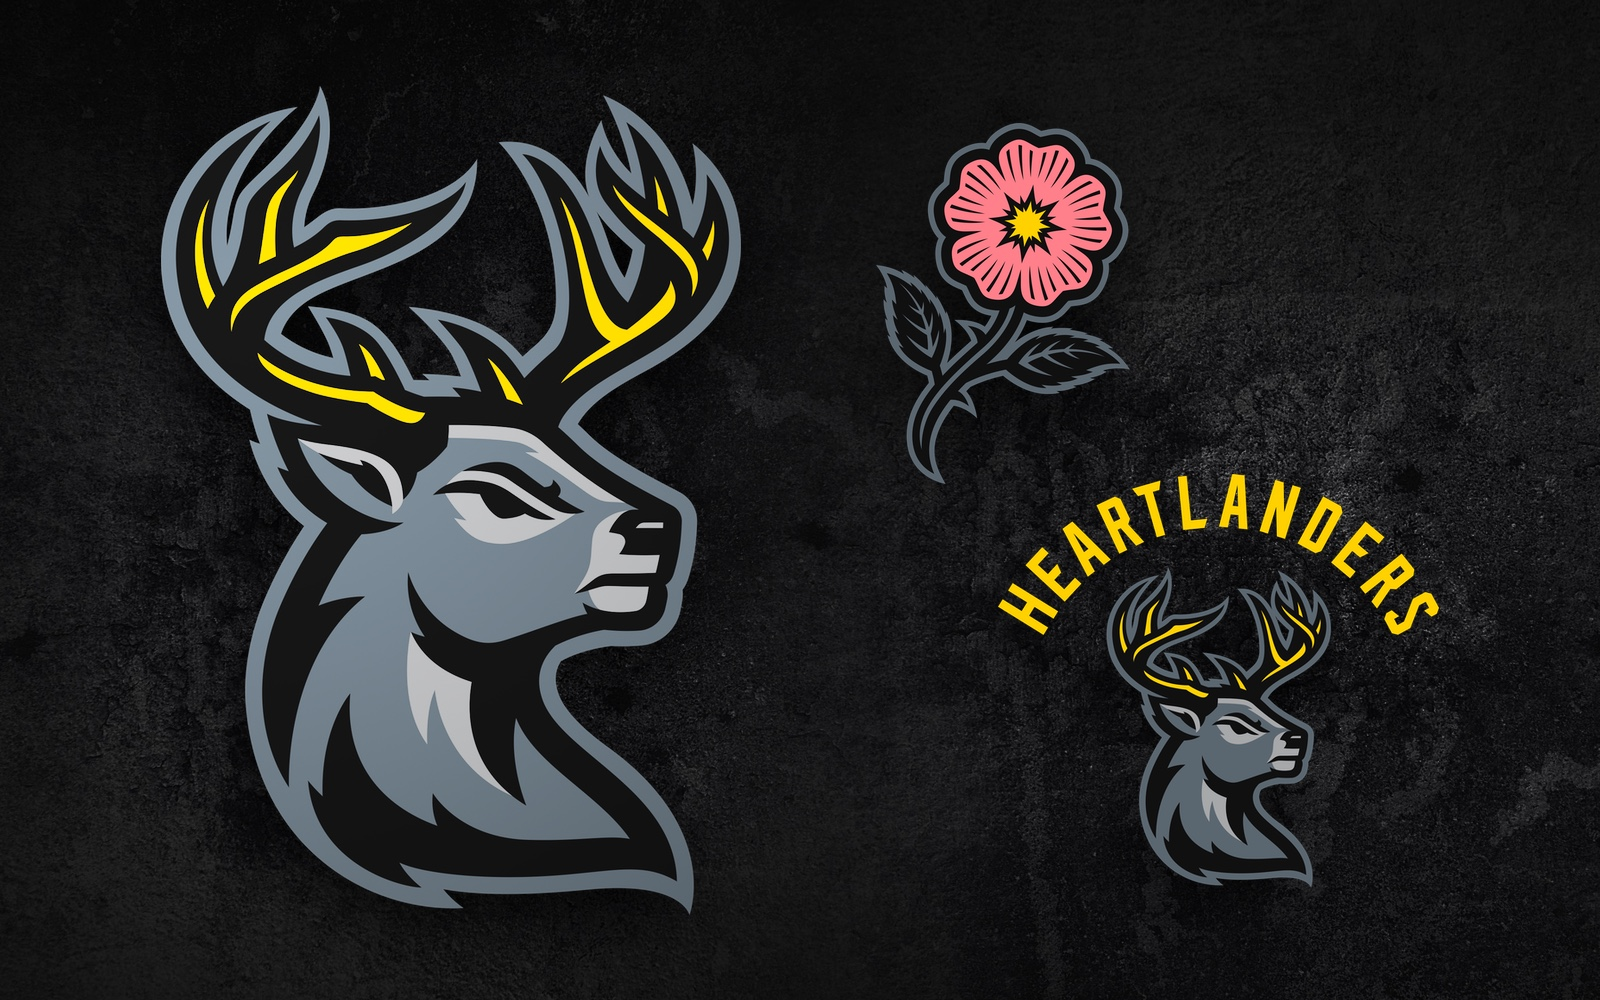 Iowa Heartlanders unveil name and logos